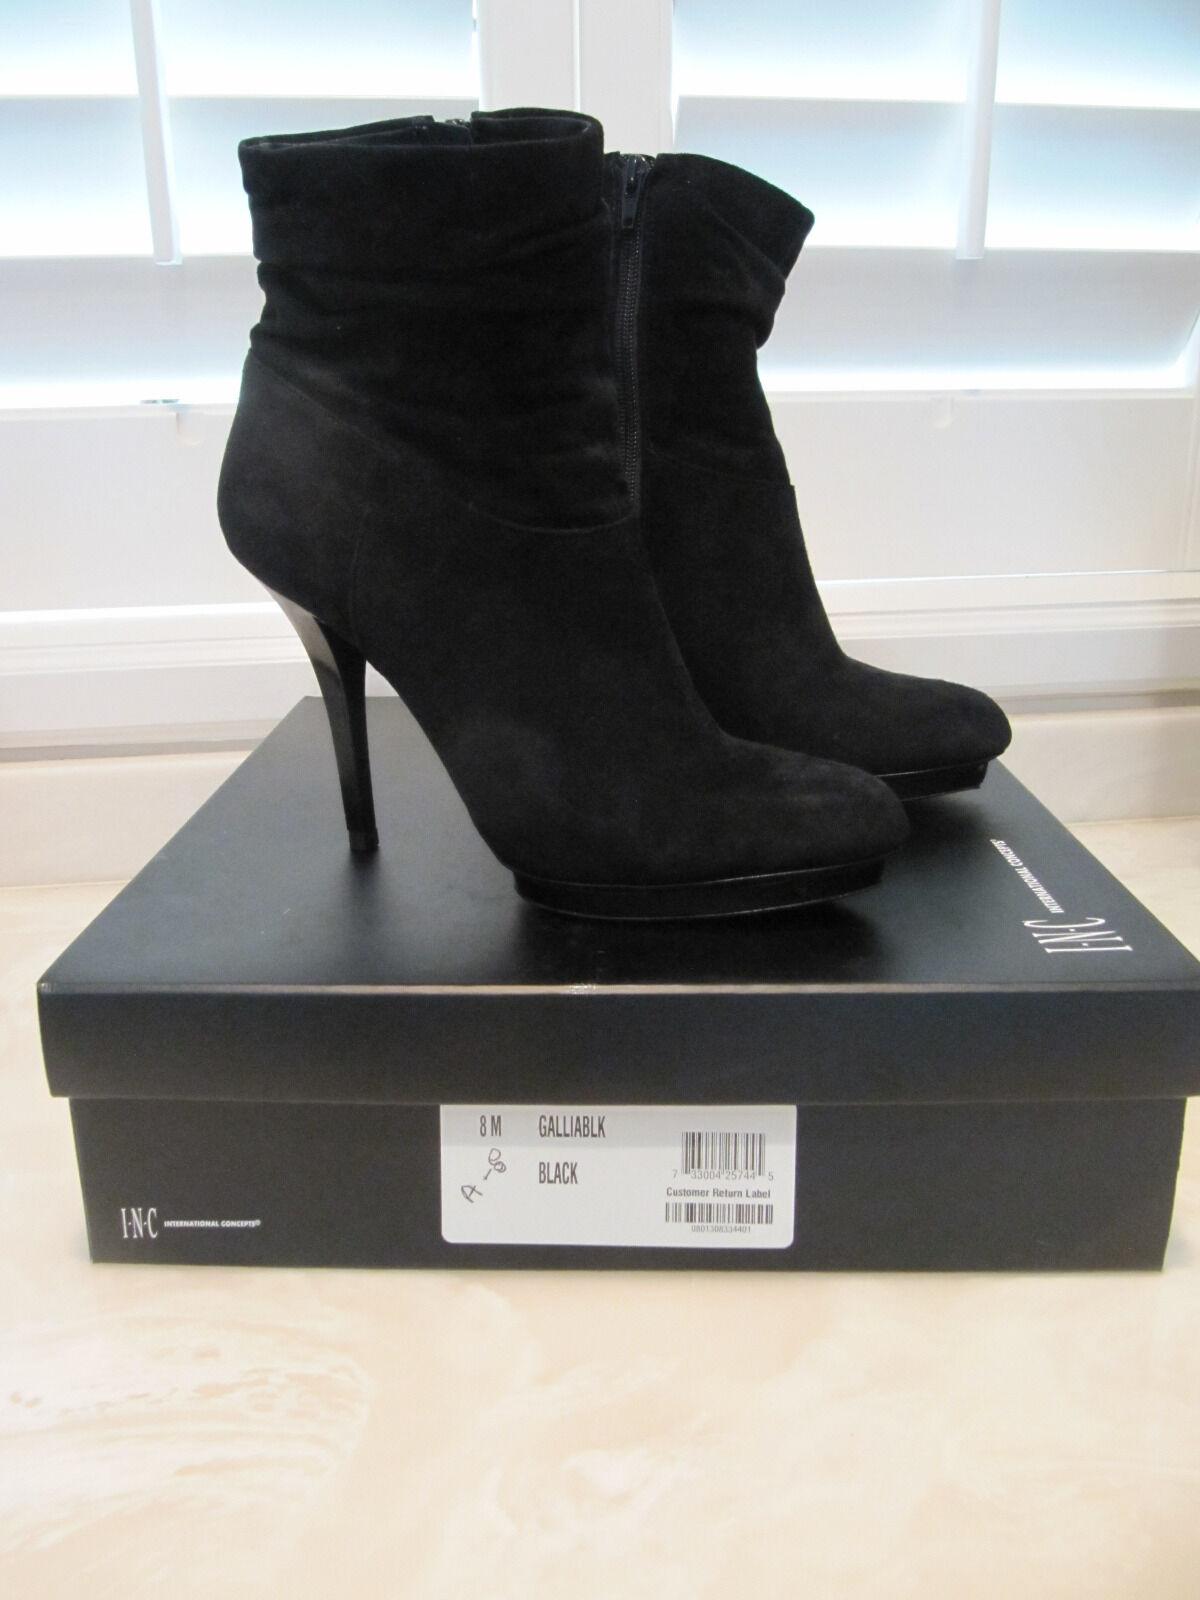 INC Gallia Black Womens shoes Size 8 M Boots MSRP  119